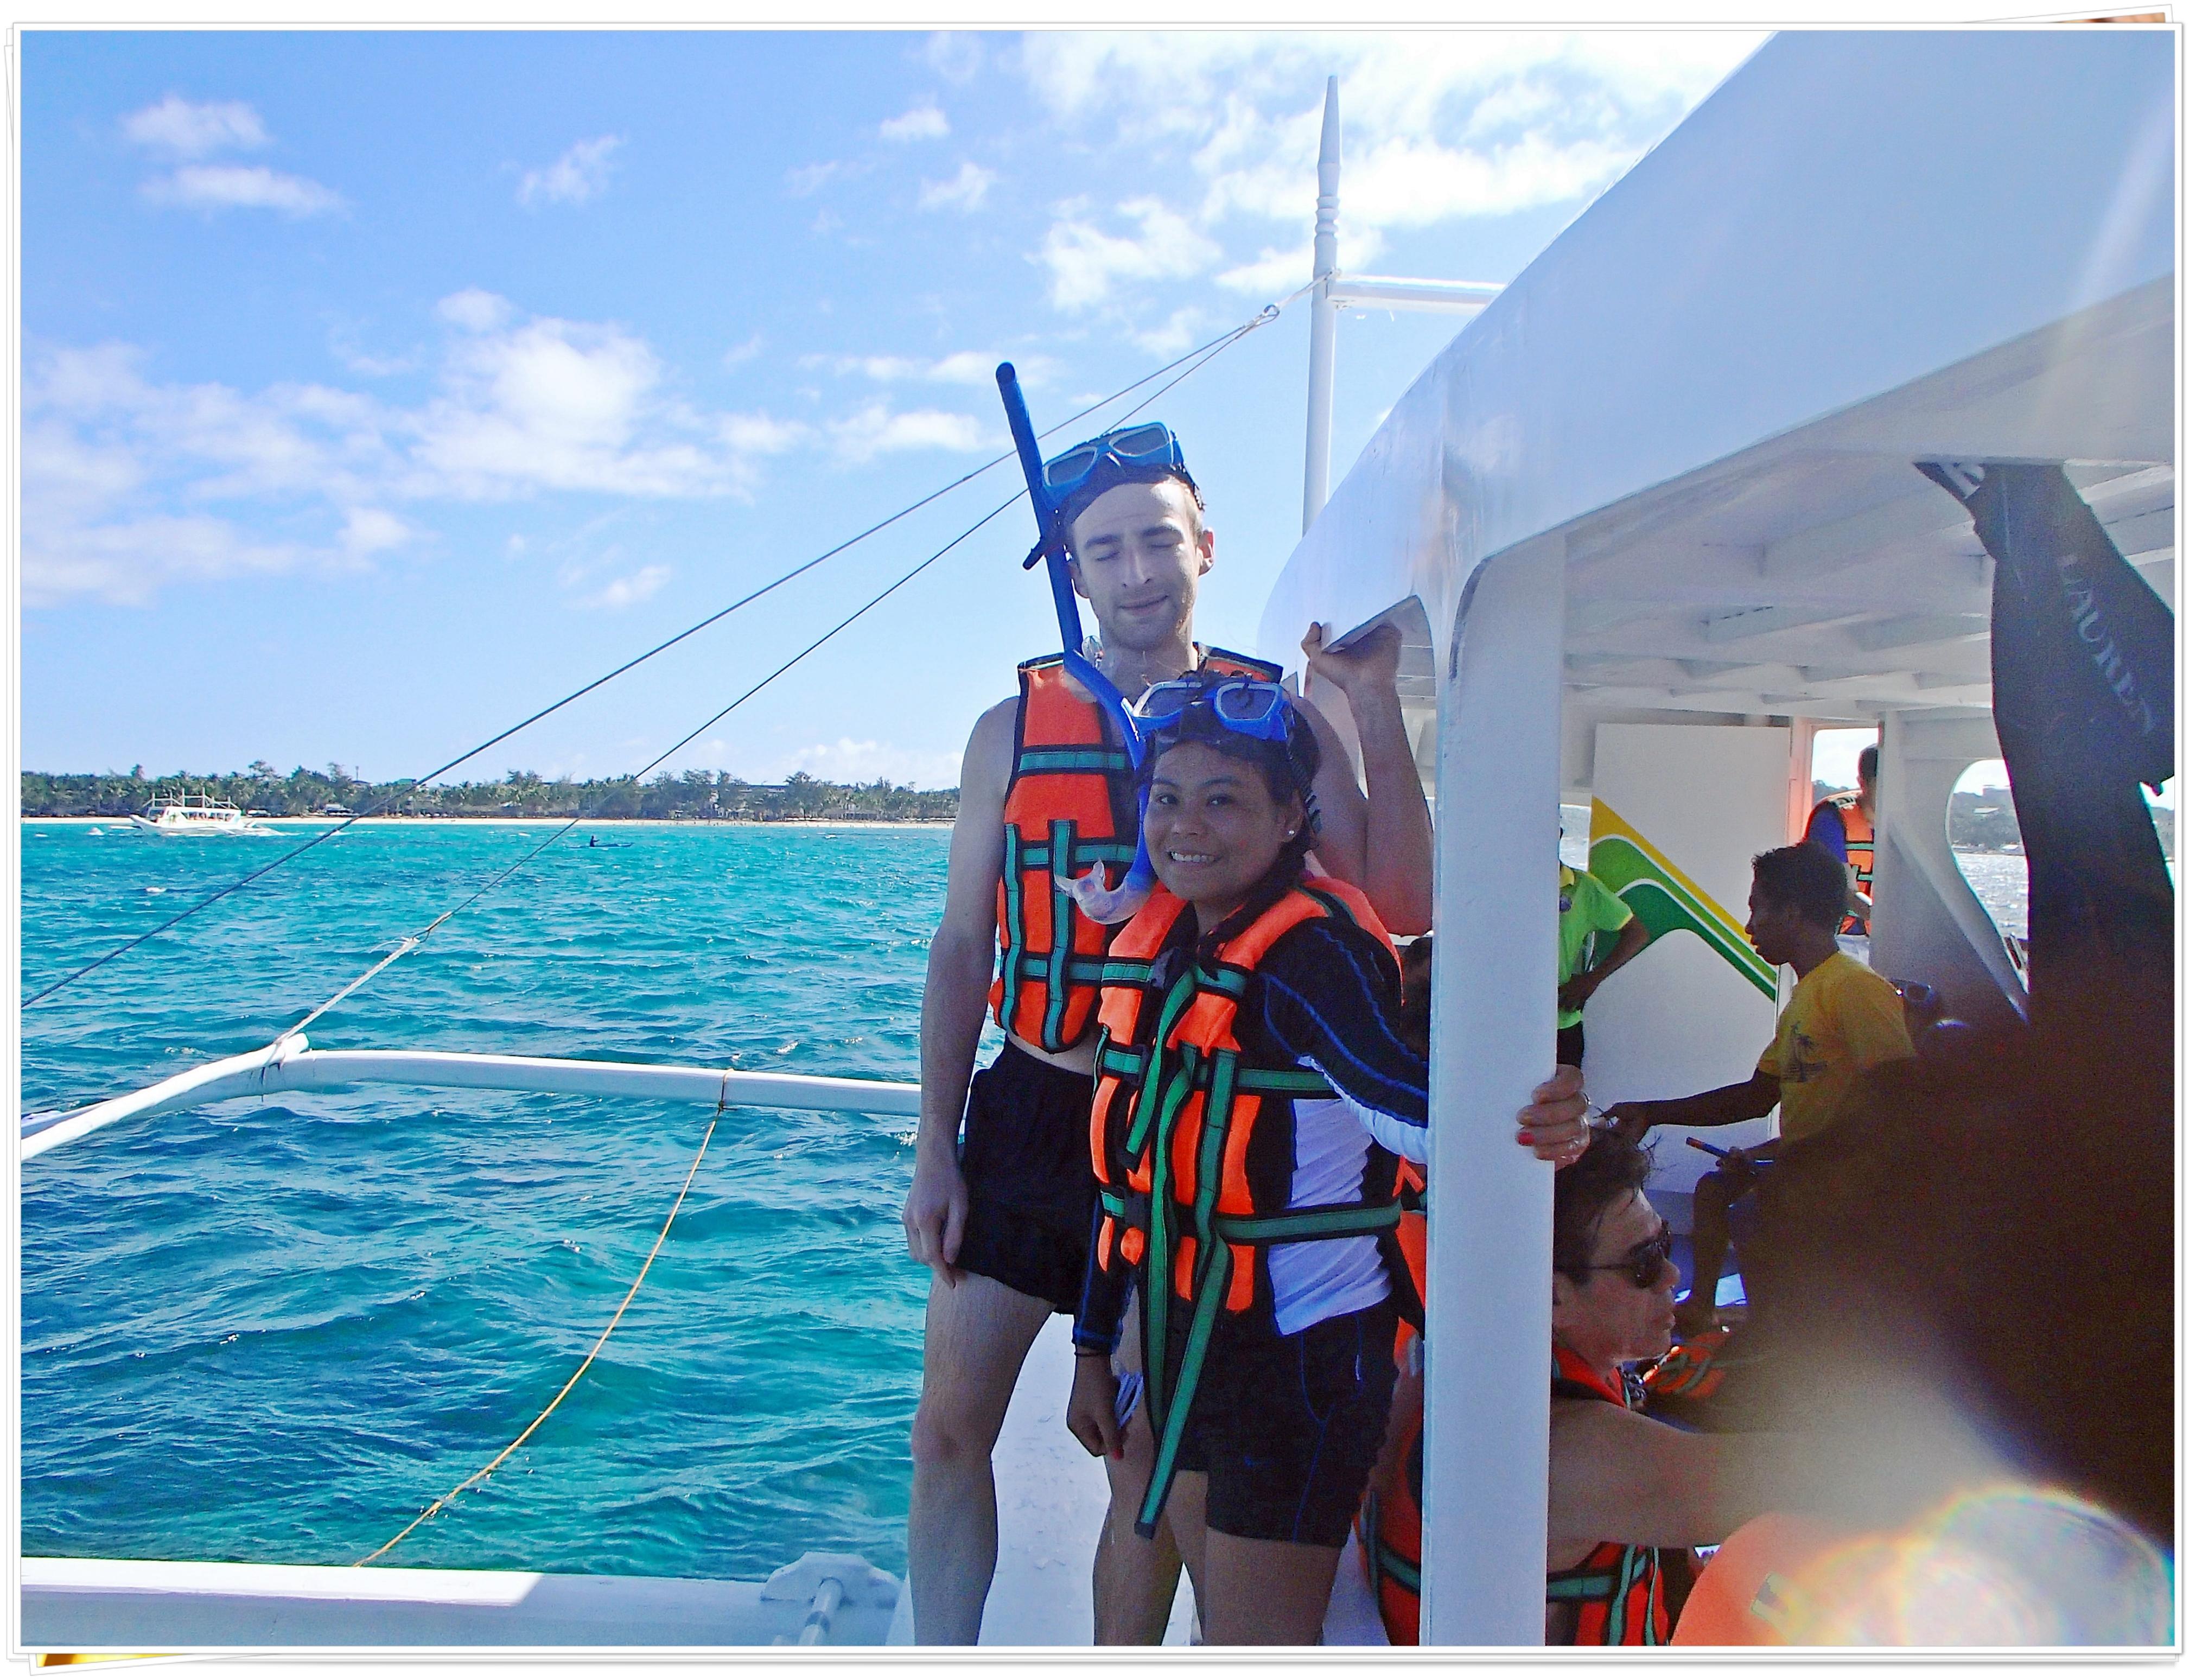 2015 Boracay Aklan Philippines (Island-hopping)